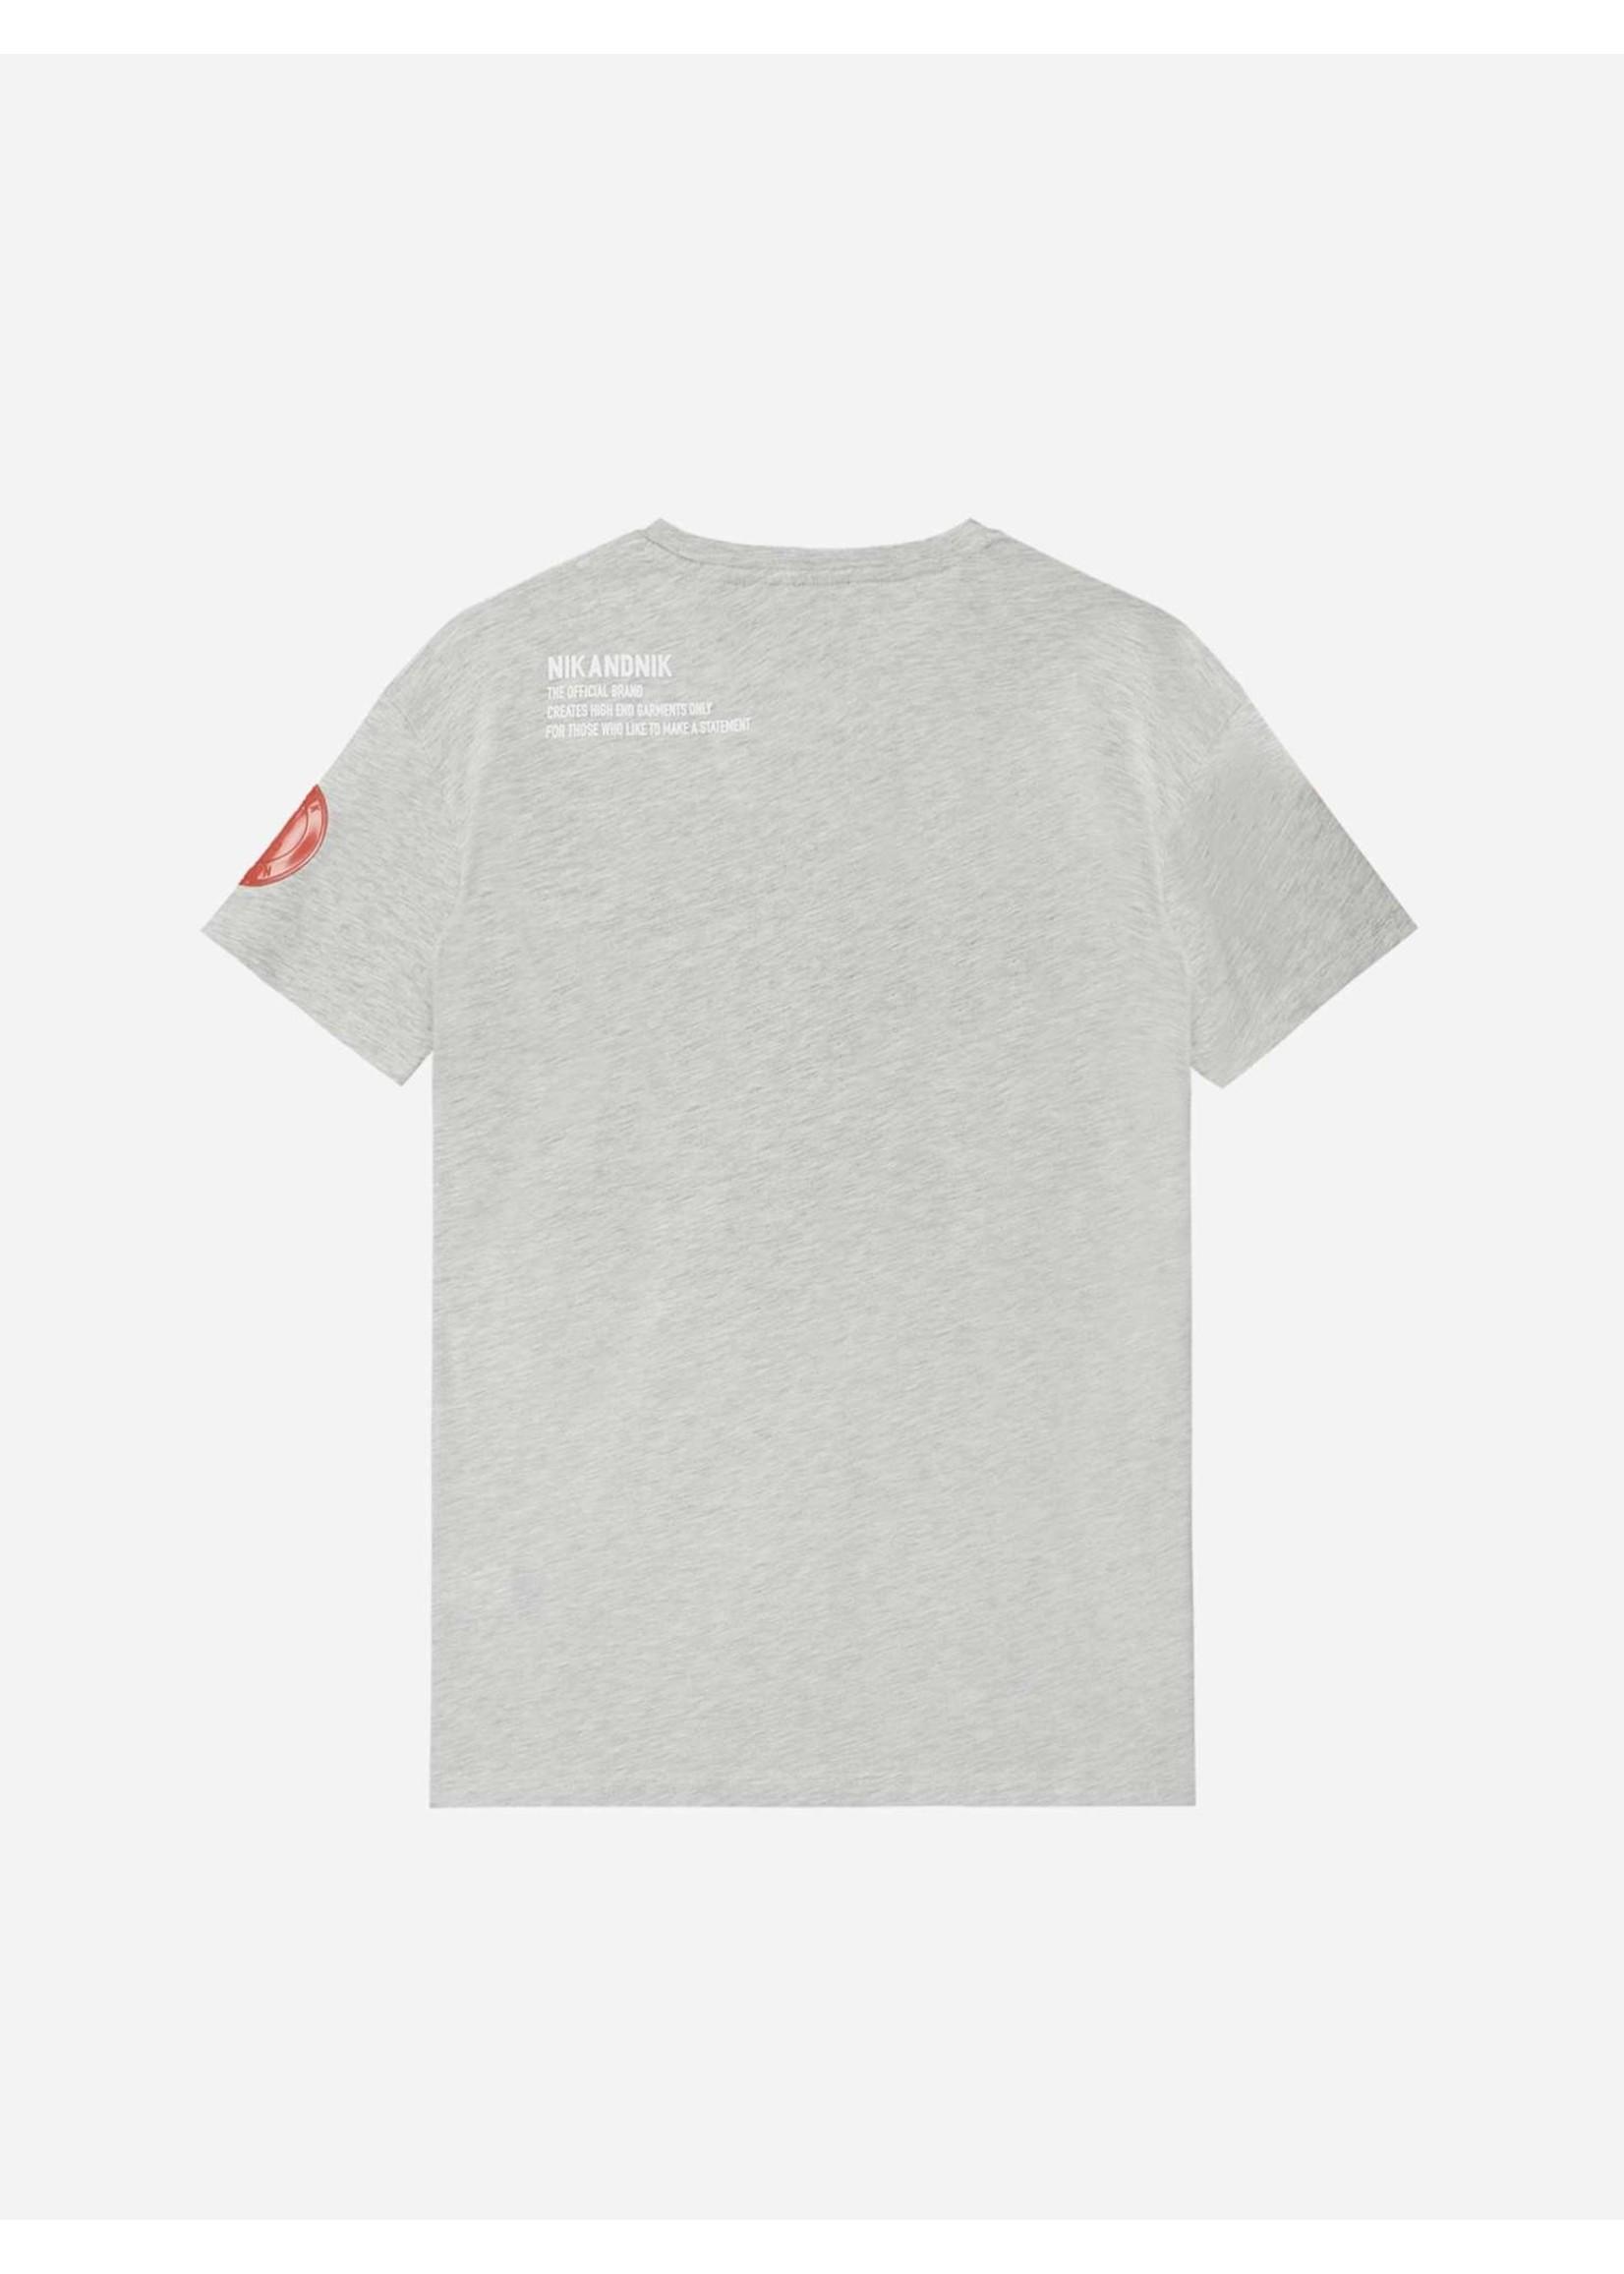 NIK&NIK Nik&Nik Marco T-Shirt - Grey Melange